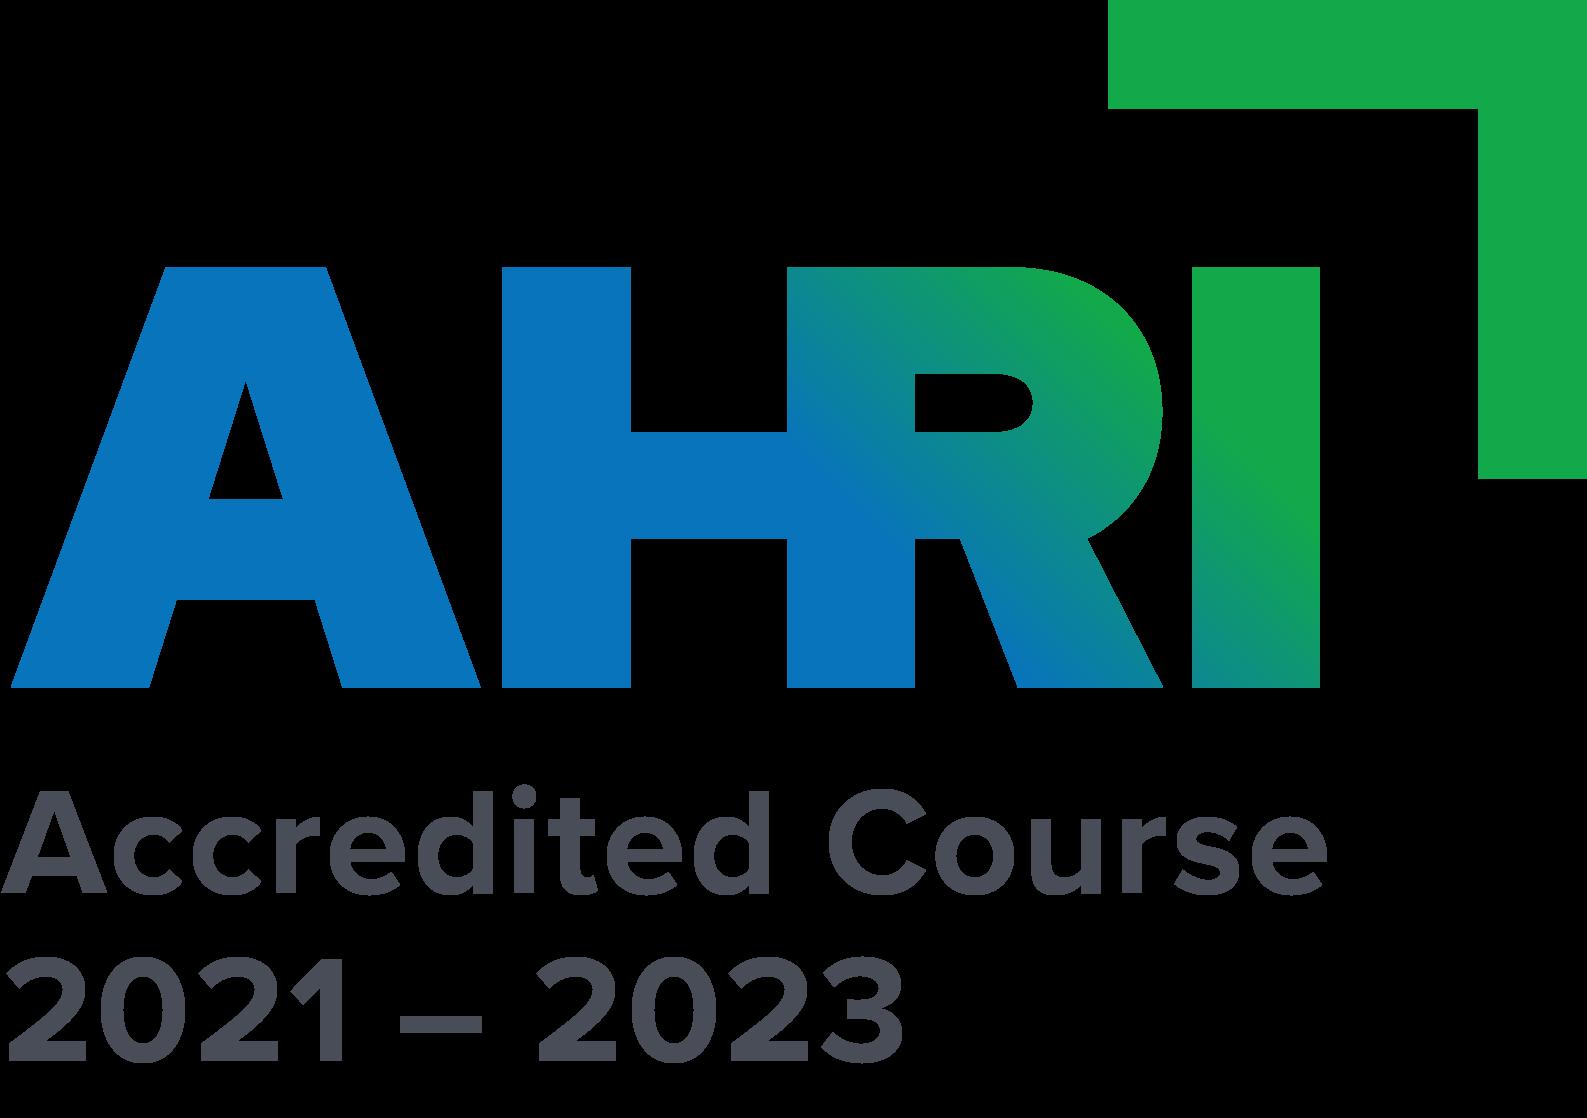 AHRI Accreditation logo